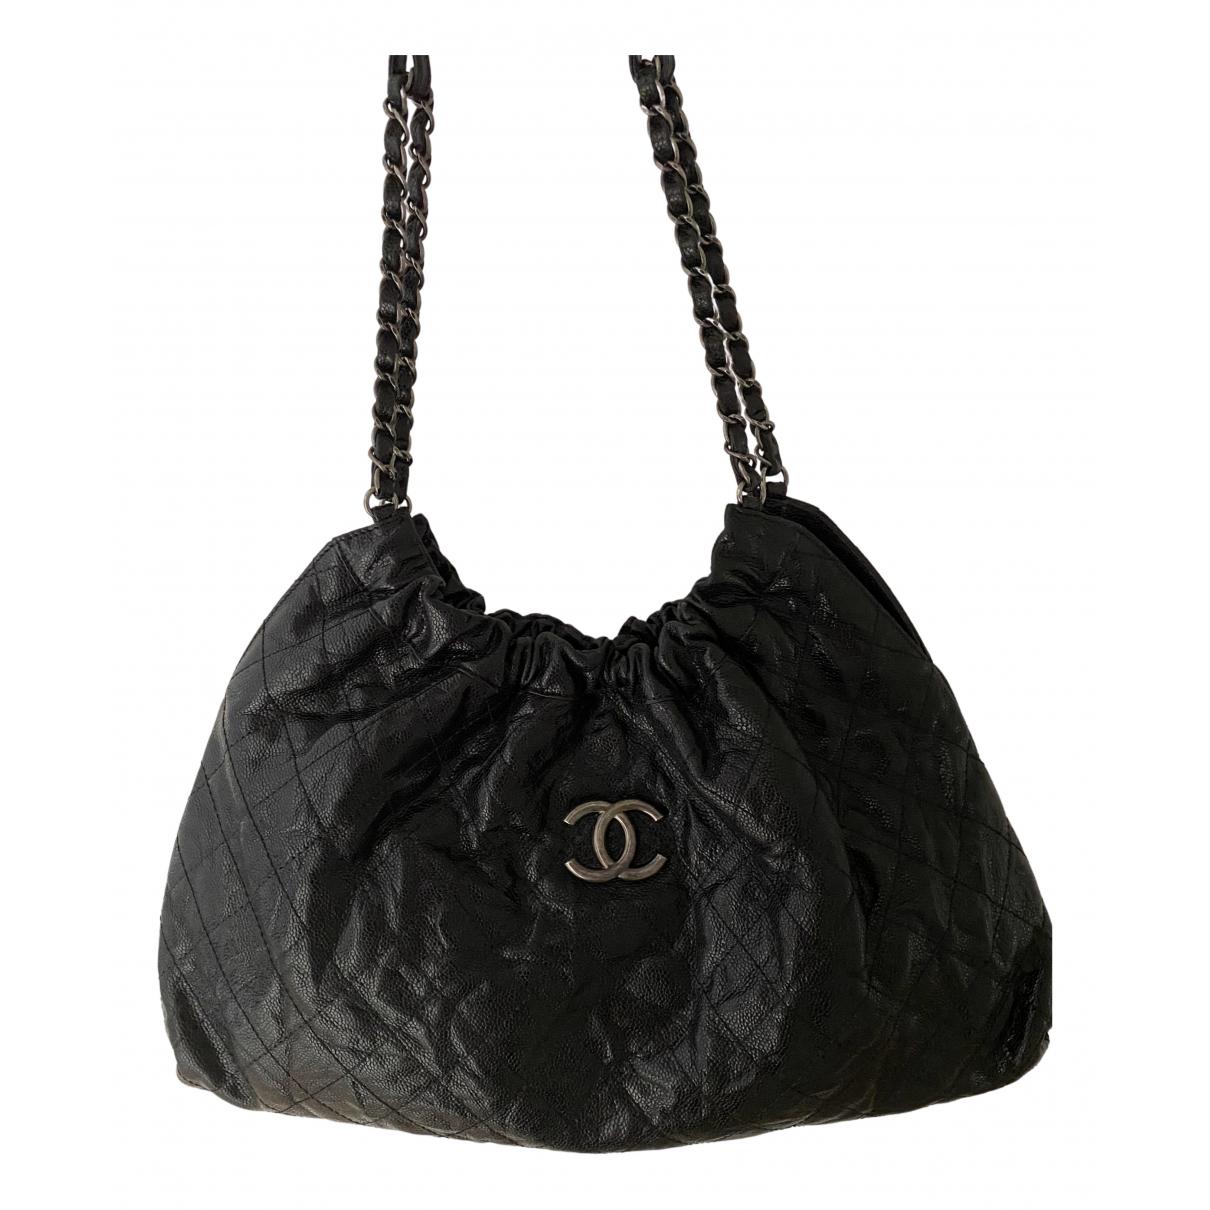 Chanel N Black Leather handbag for Women N